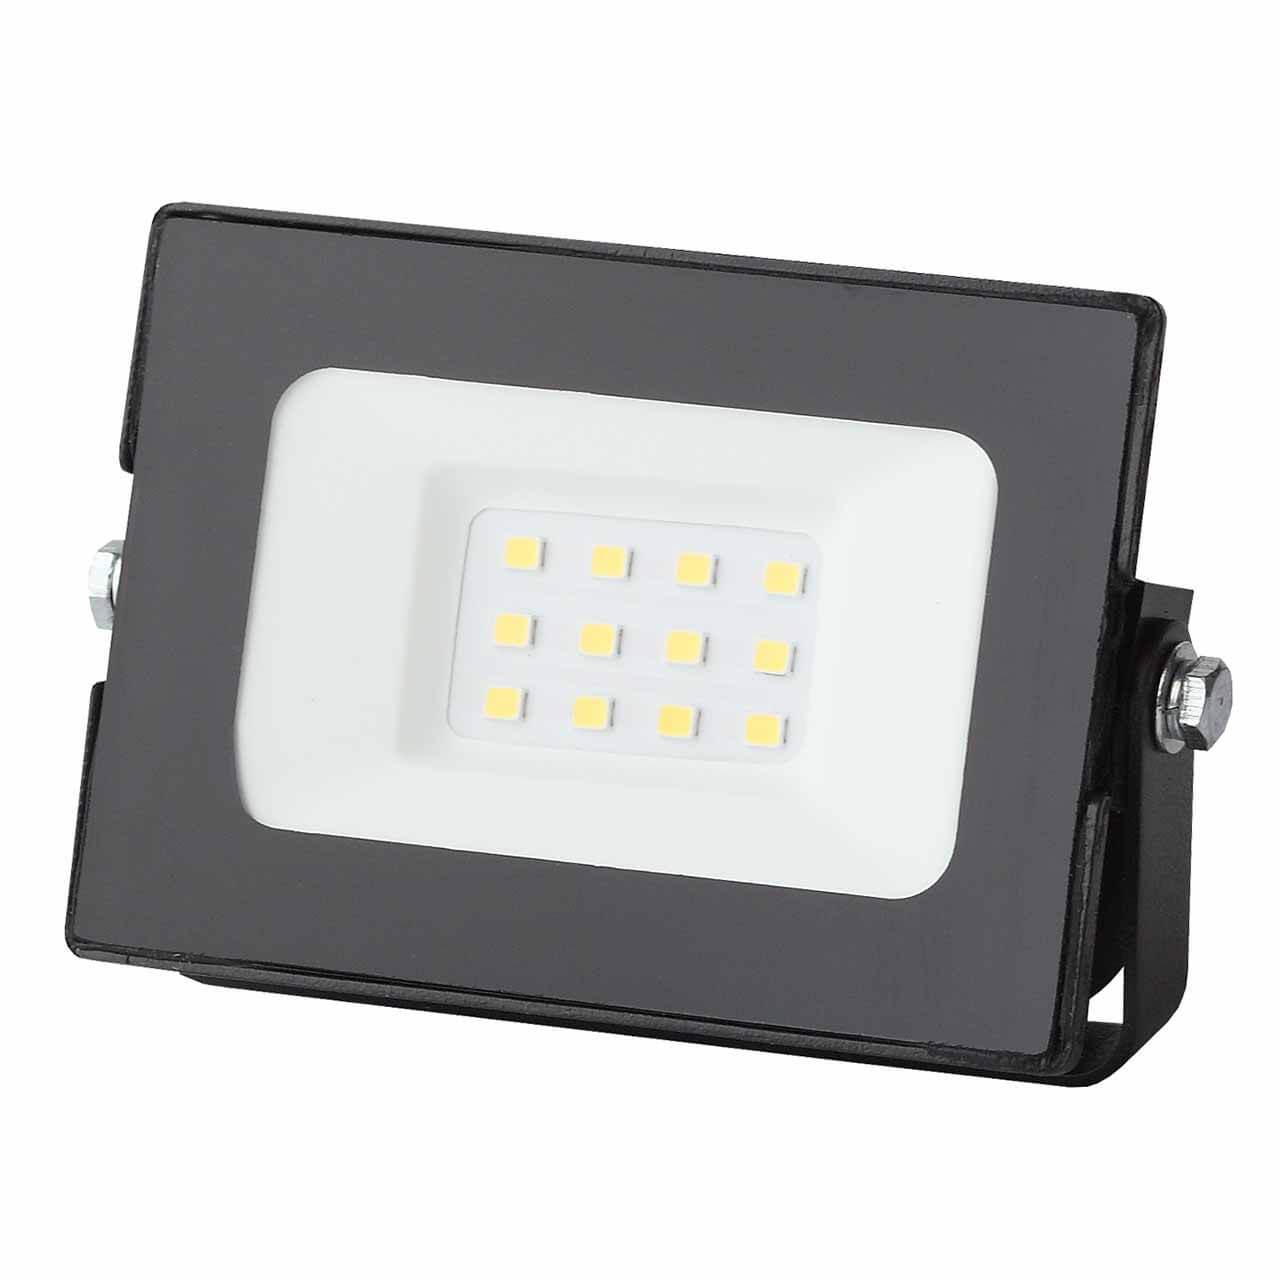 Прожектор ЭРА LPR-021-0-40K-010 PR-021